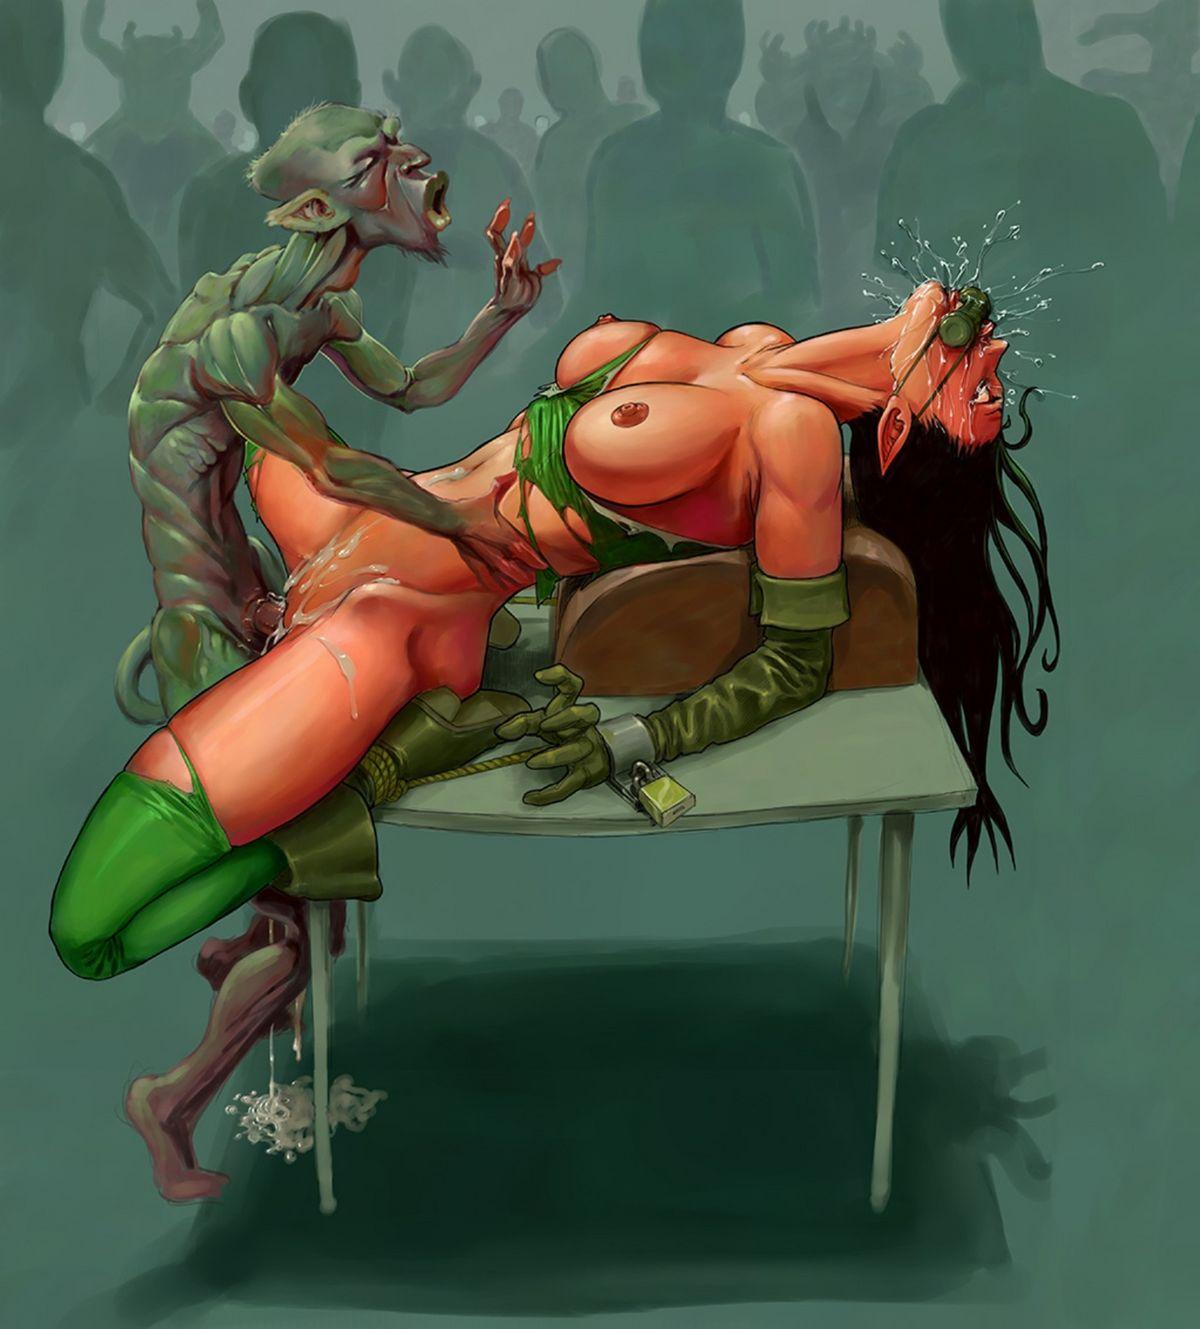 X-ray hentai anal sex tube